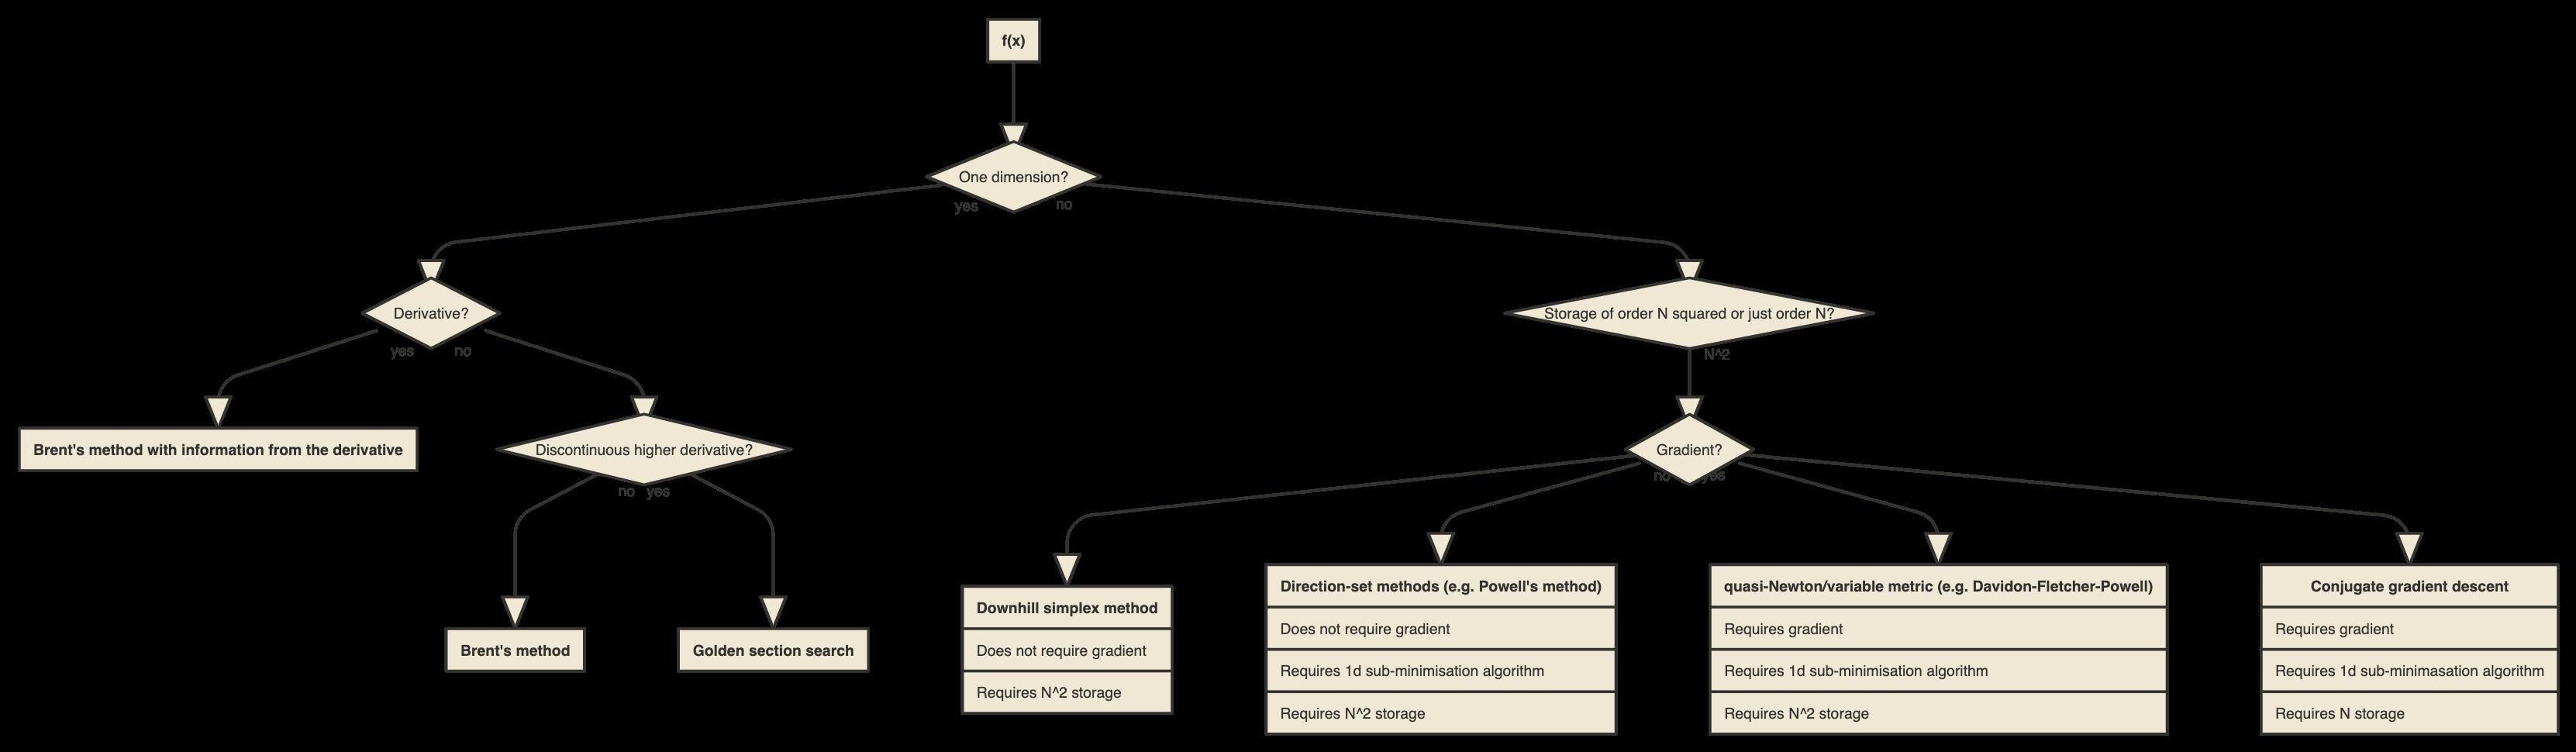 Optimisation flowchart